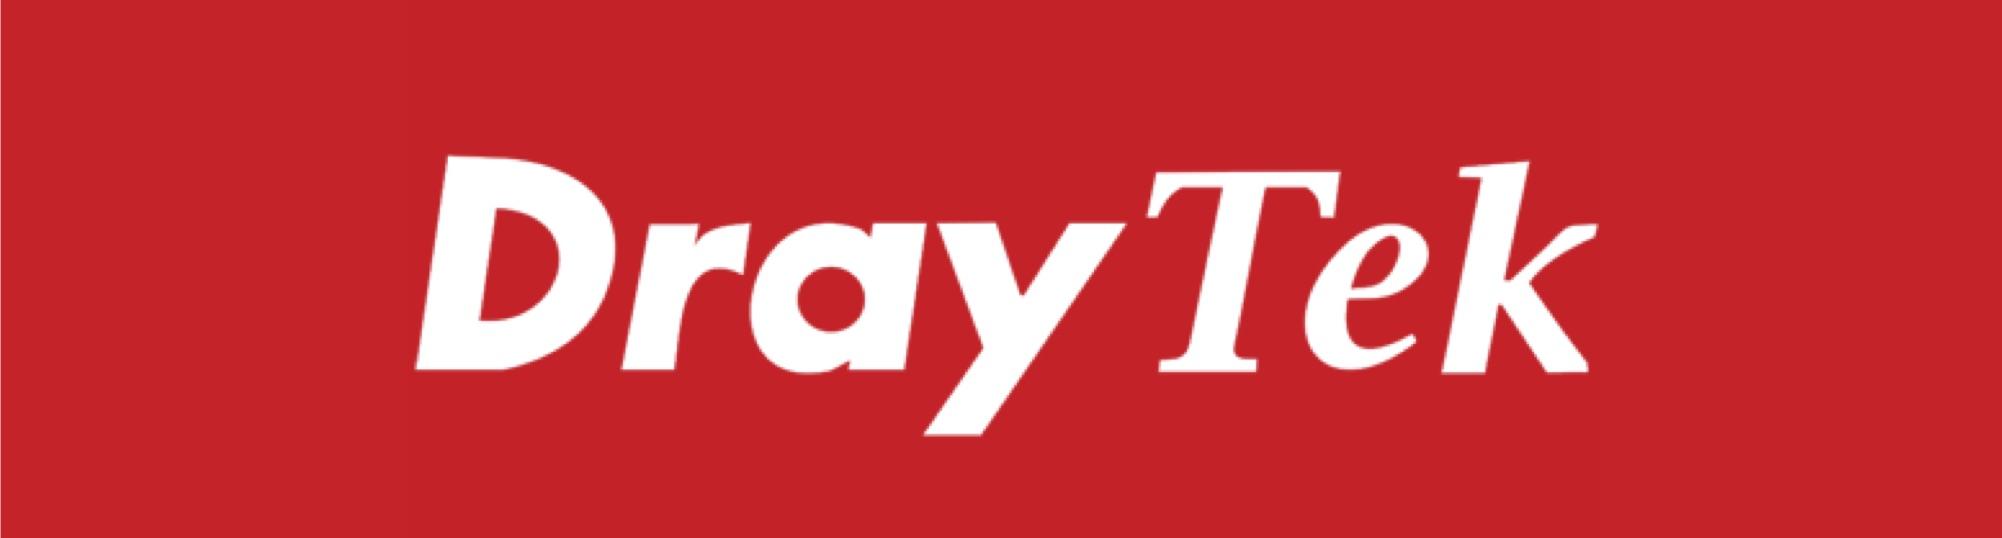 Trebbo: Draytek product nieuws